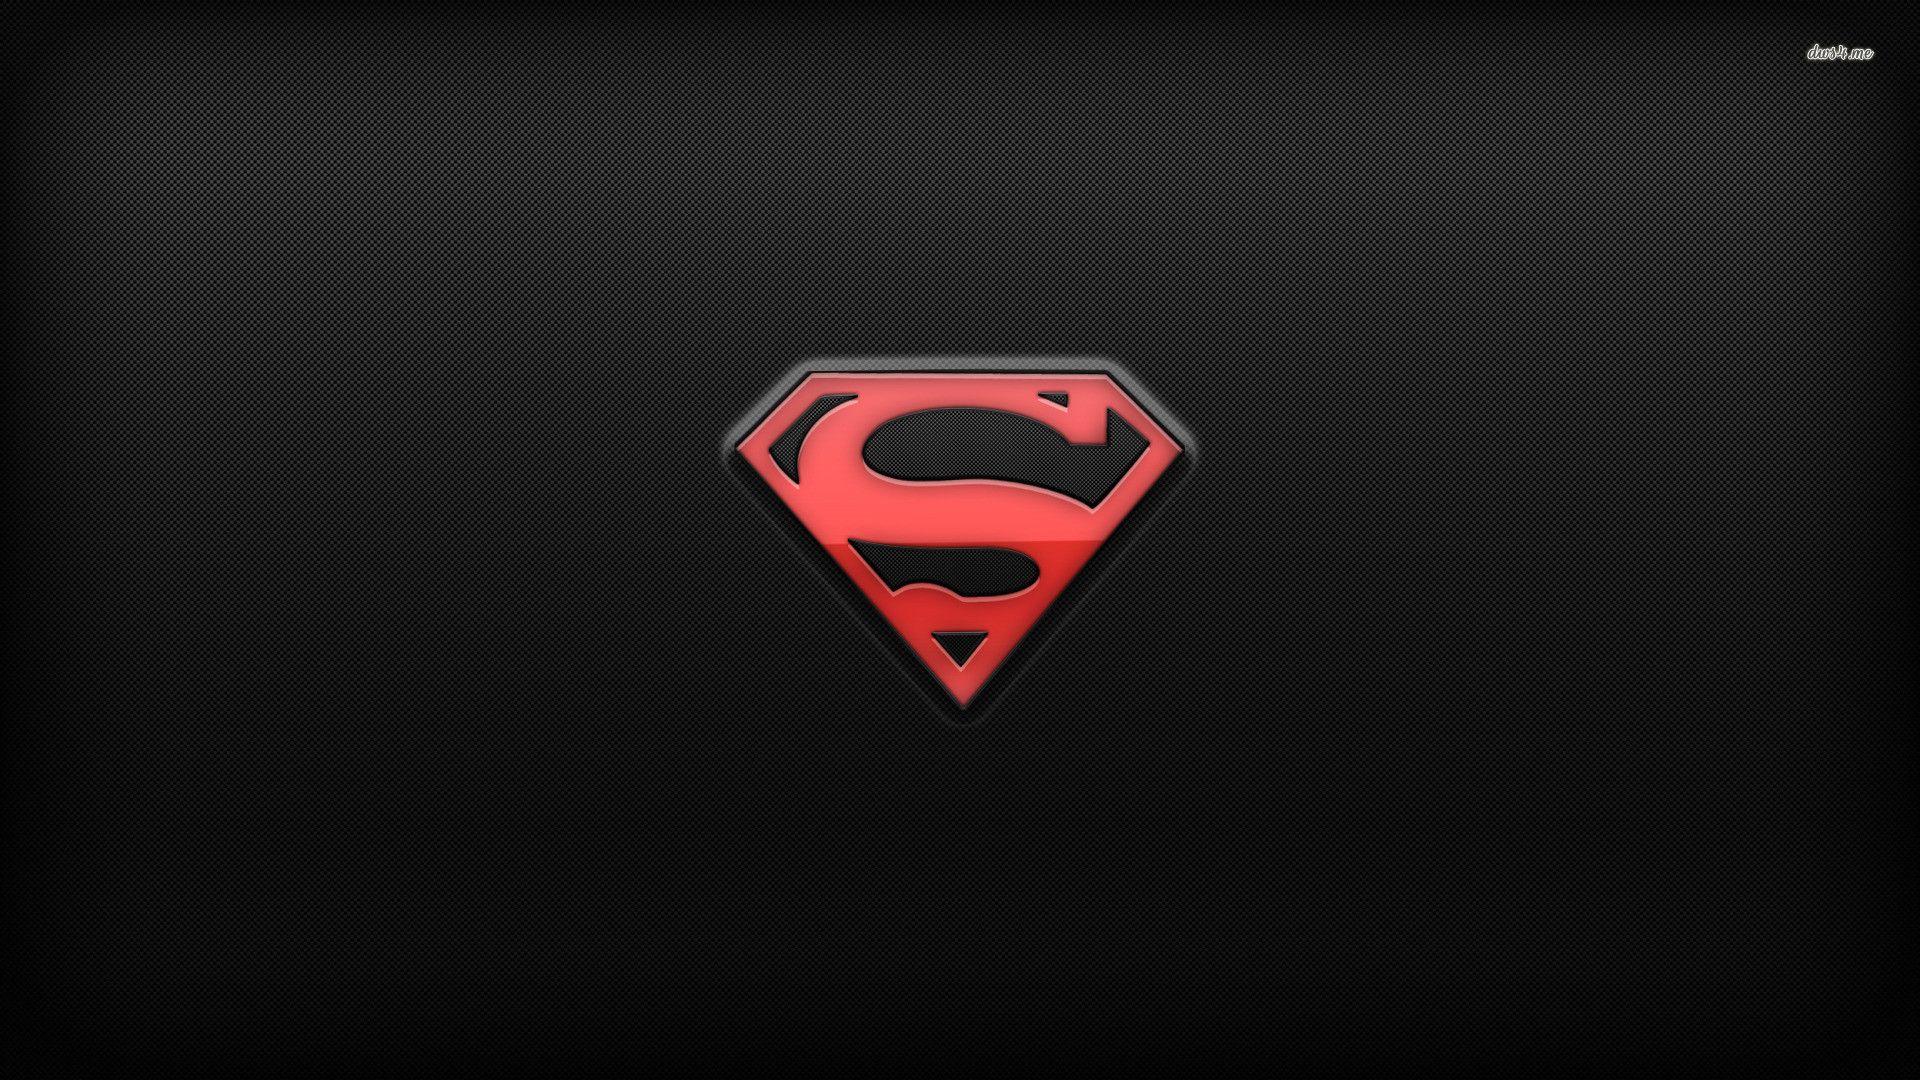 1920x1080 11044 superman logo 1920x1080 movie wallpaper comic book 1920x1080 11044 superman logo 1920x1080 movie wallpaper voltagebd Gallery